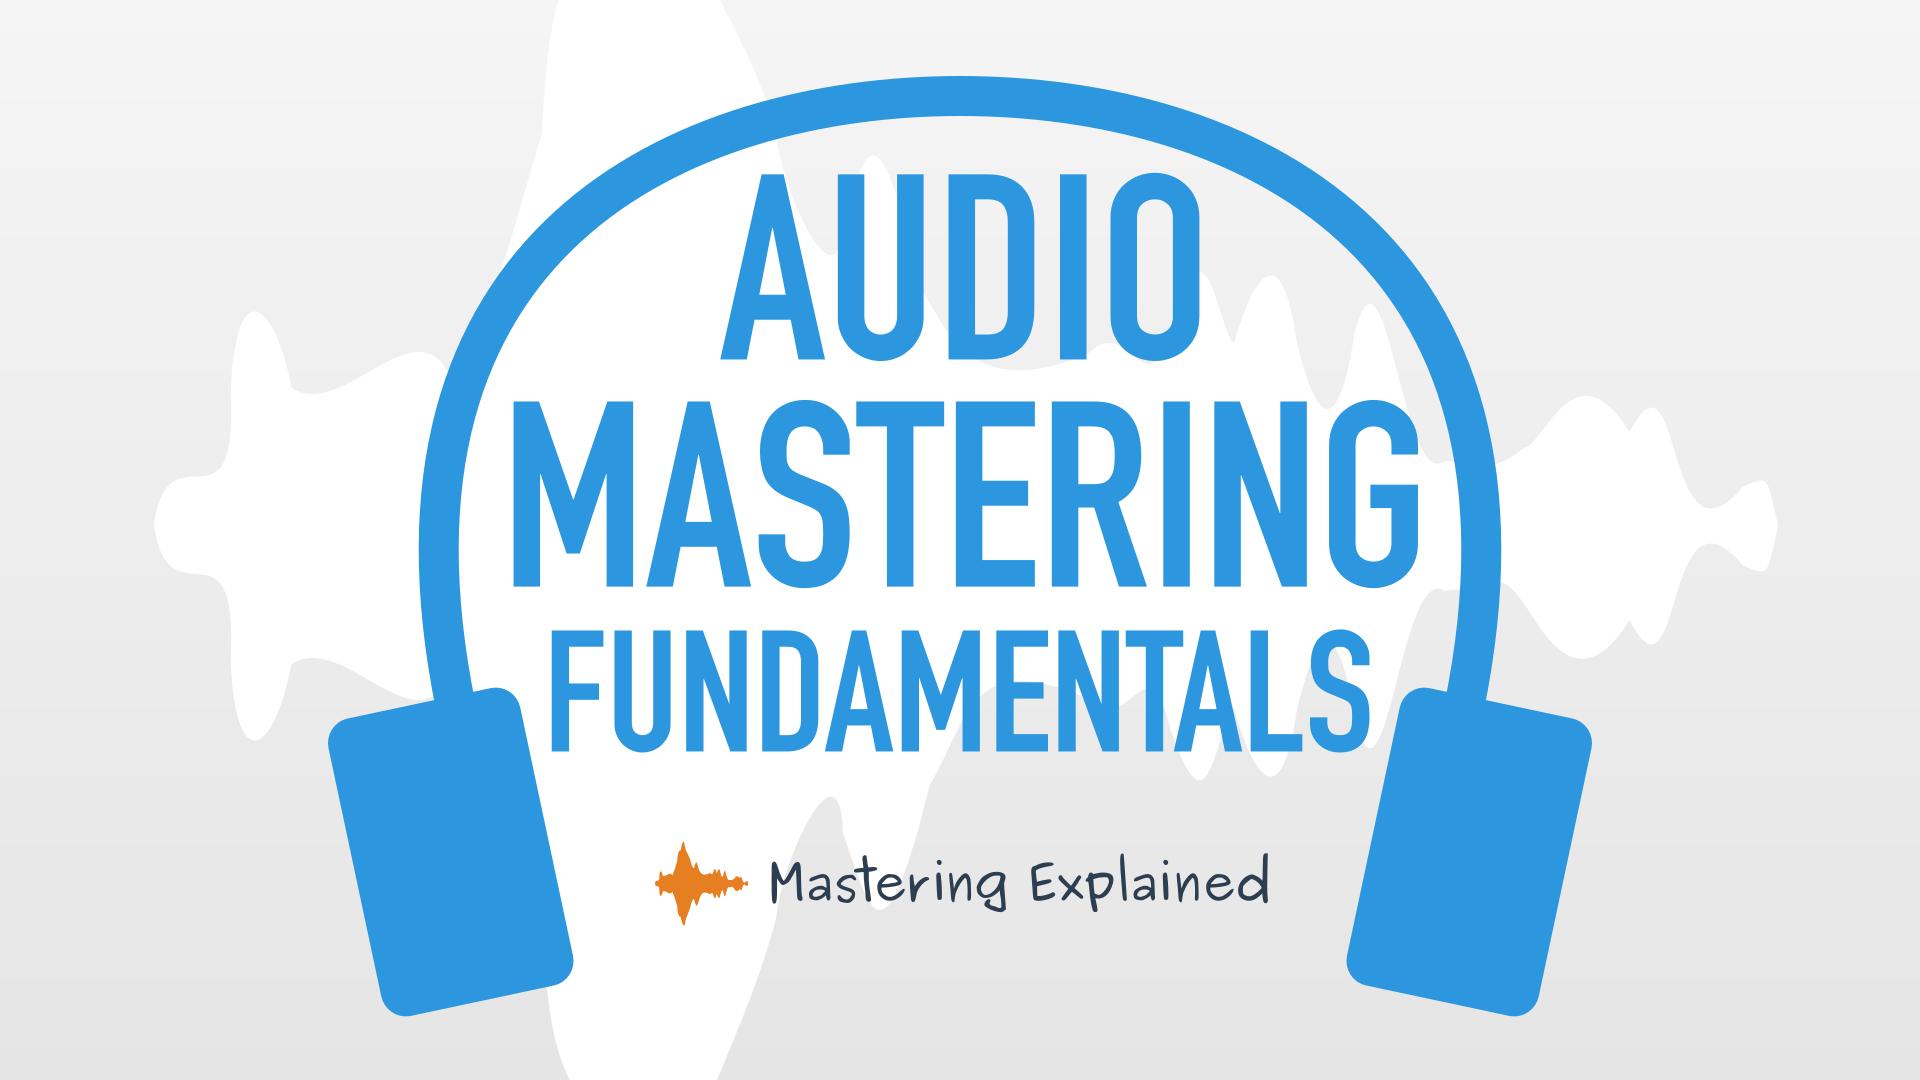 Audio mastering course logo